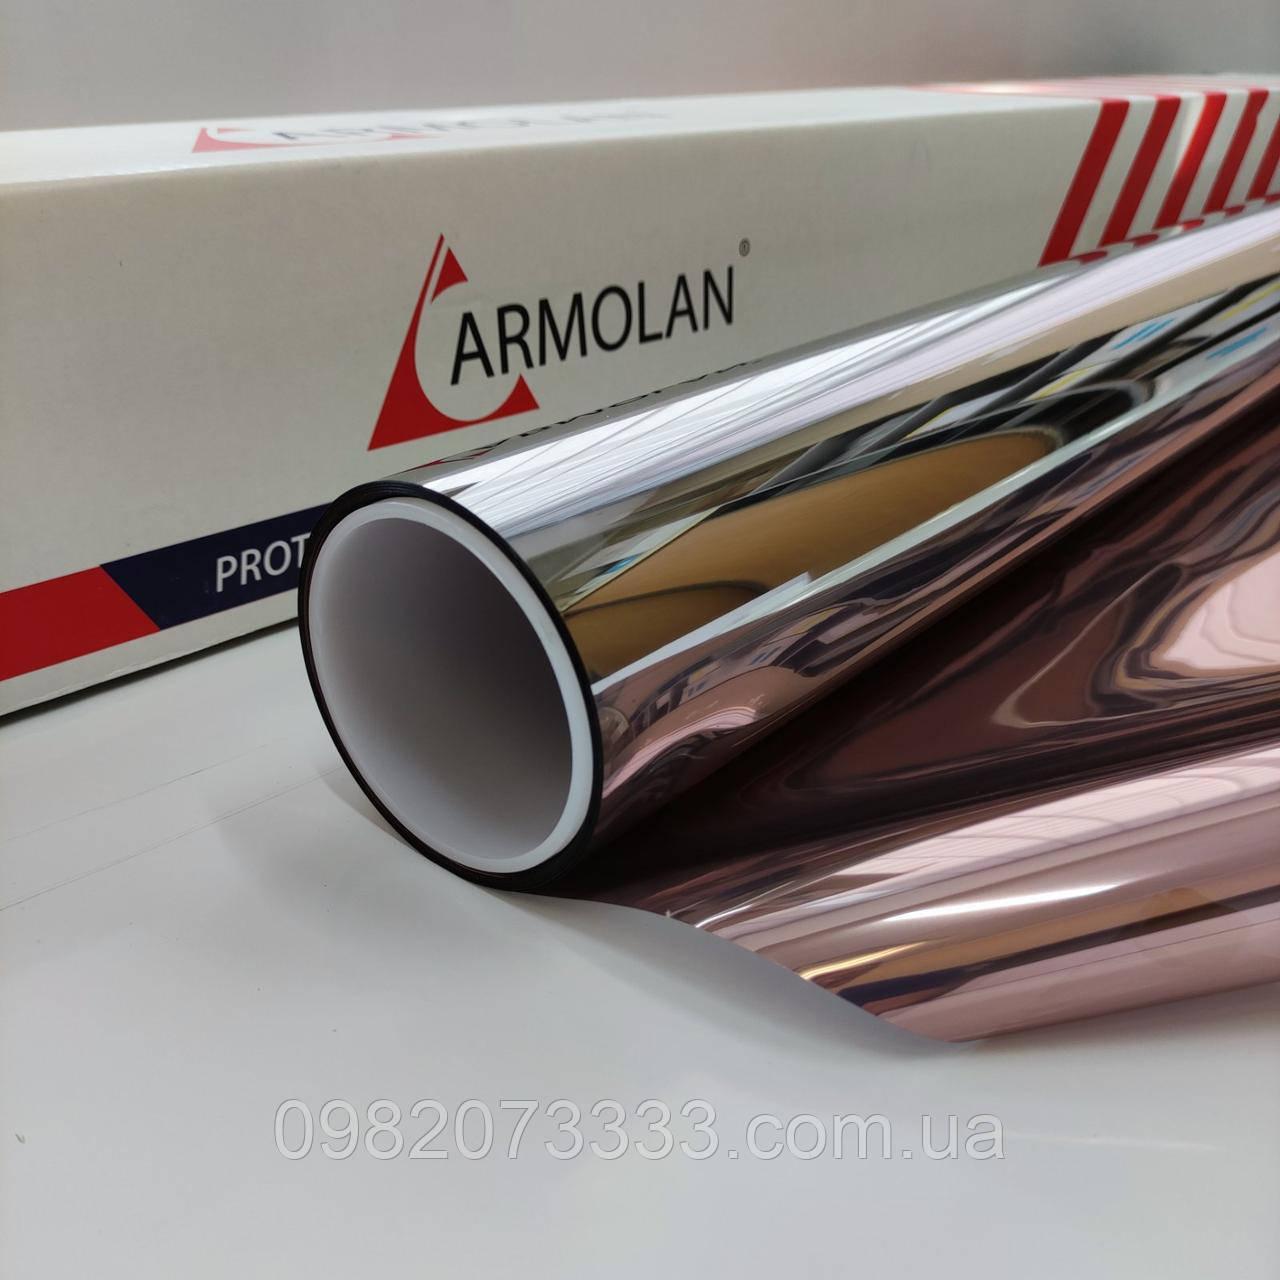 Тонировочная плёнка  Armolan R Bronze 15 зеркальная плёнка для тонировки окон ширина 1,524м